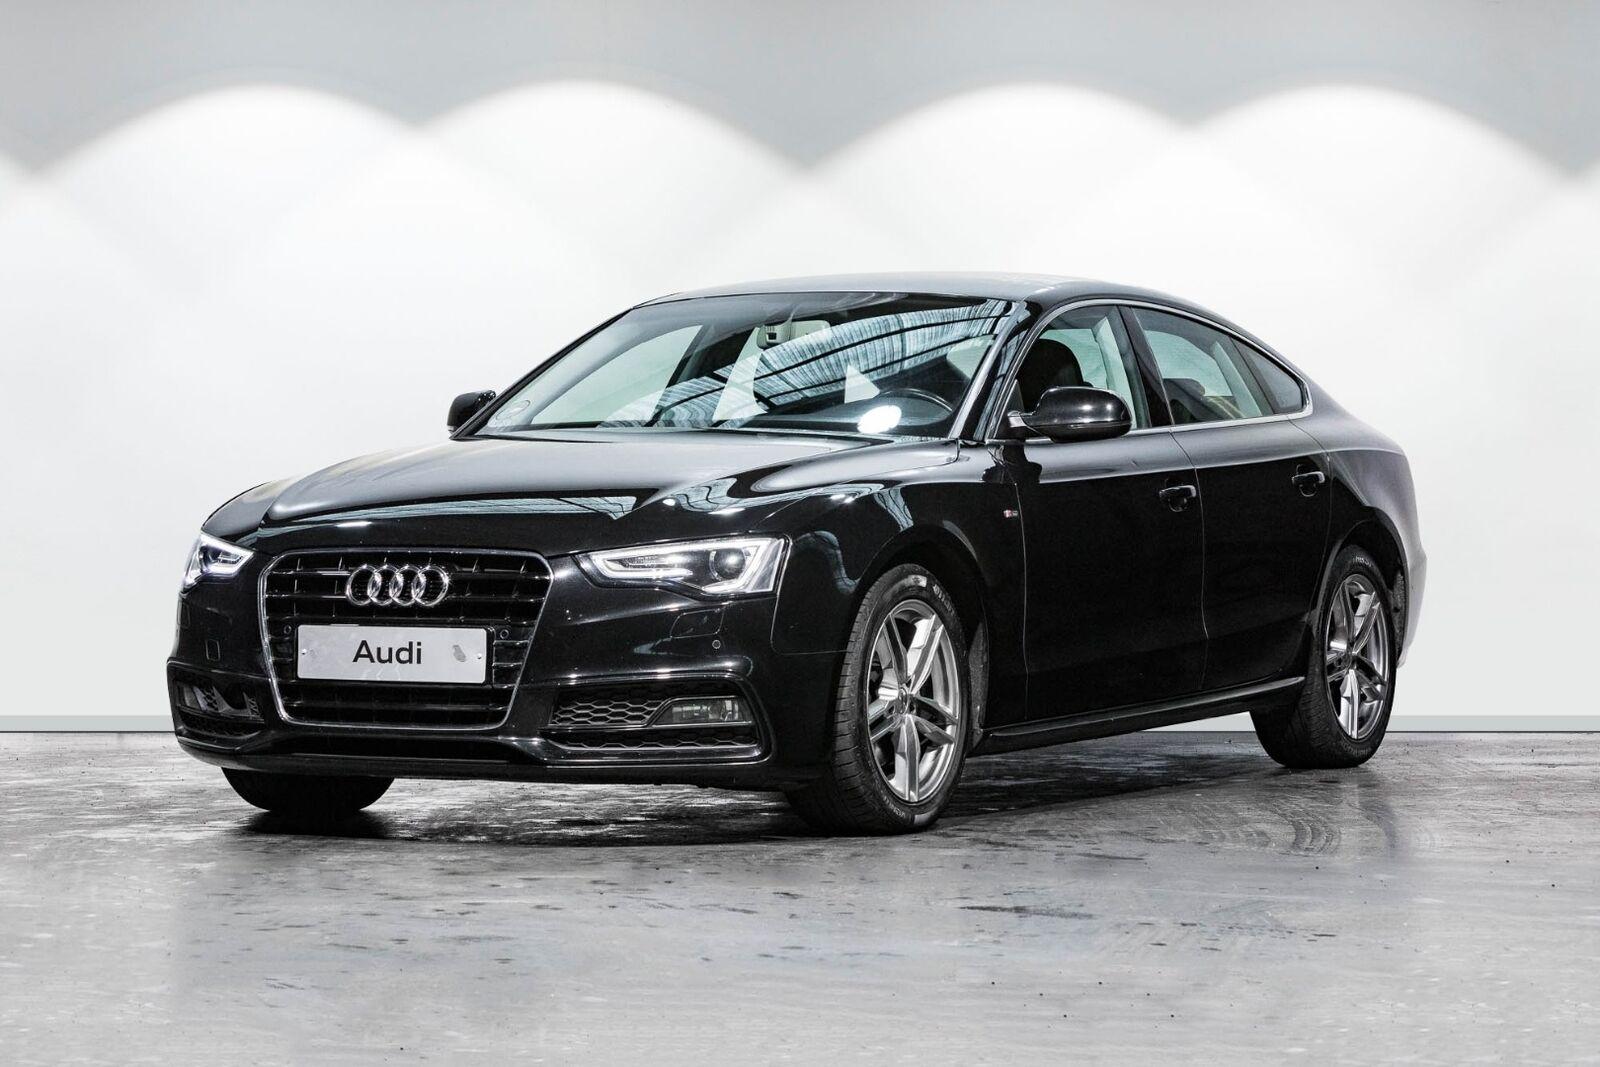 Audi A5 2,0 TDi 190 Sportback Multitr. 5d - 289.900 kr.